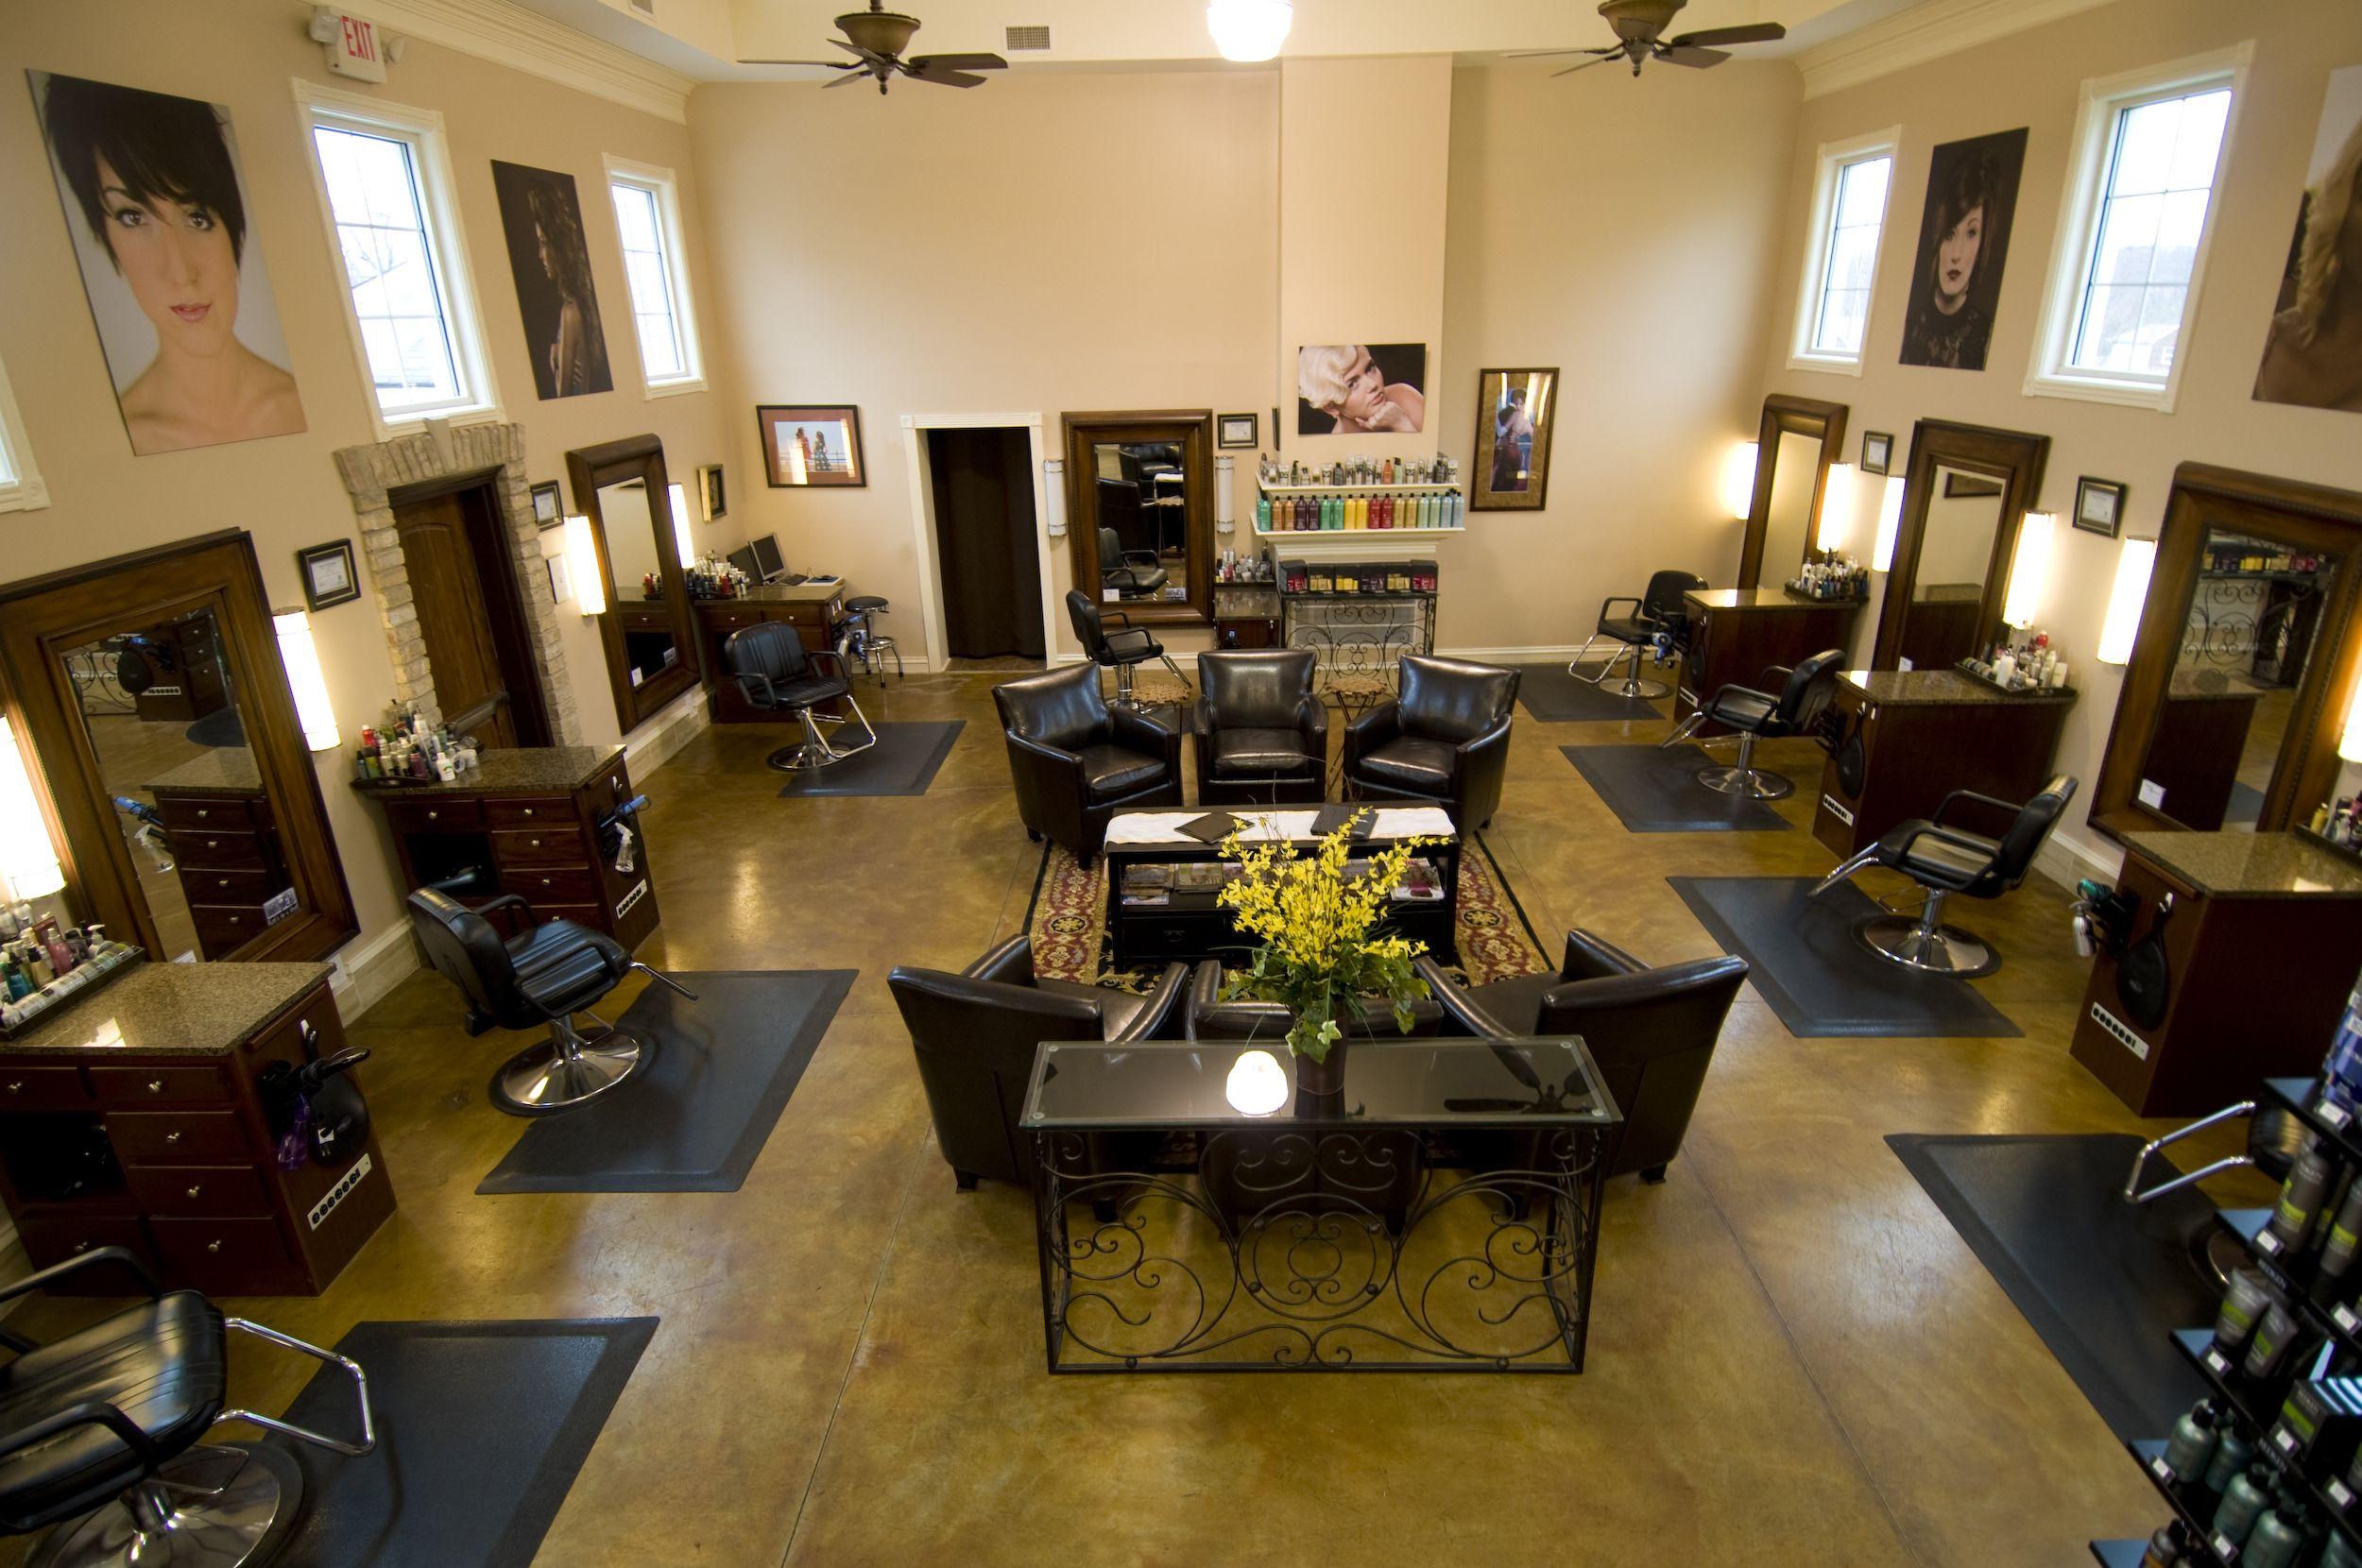 How AWESOME Does The Breon Hair Salon In Nashville TN Look Xoxo - The look hair salon